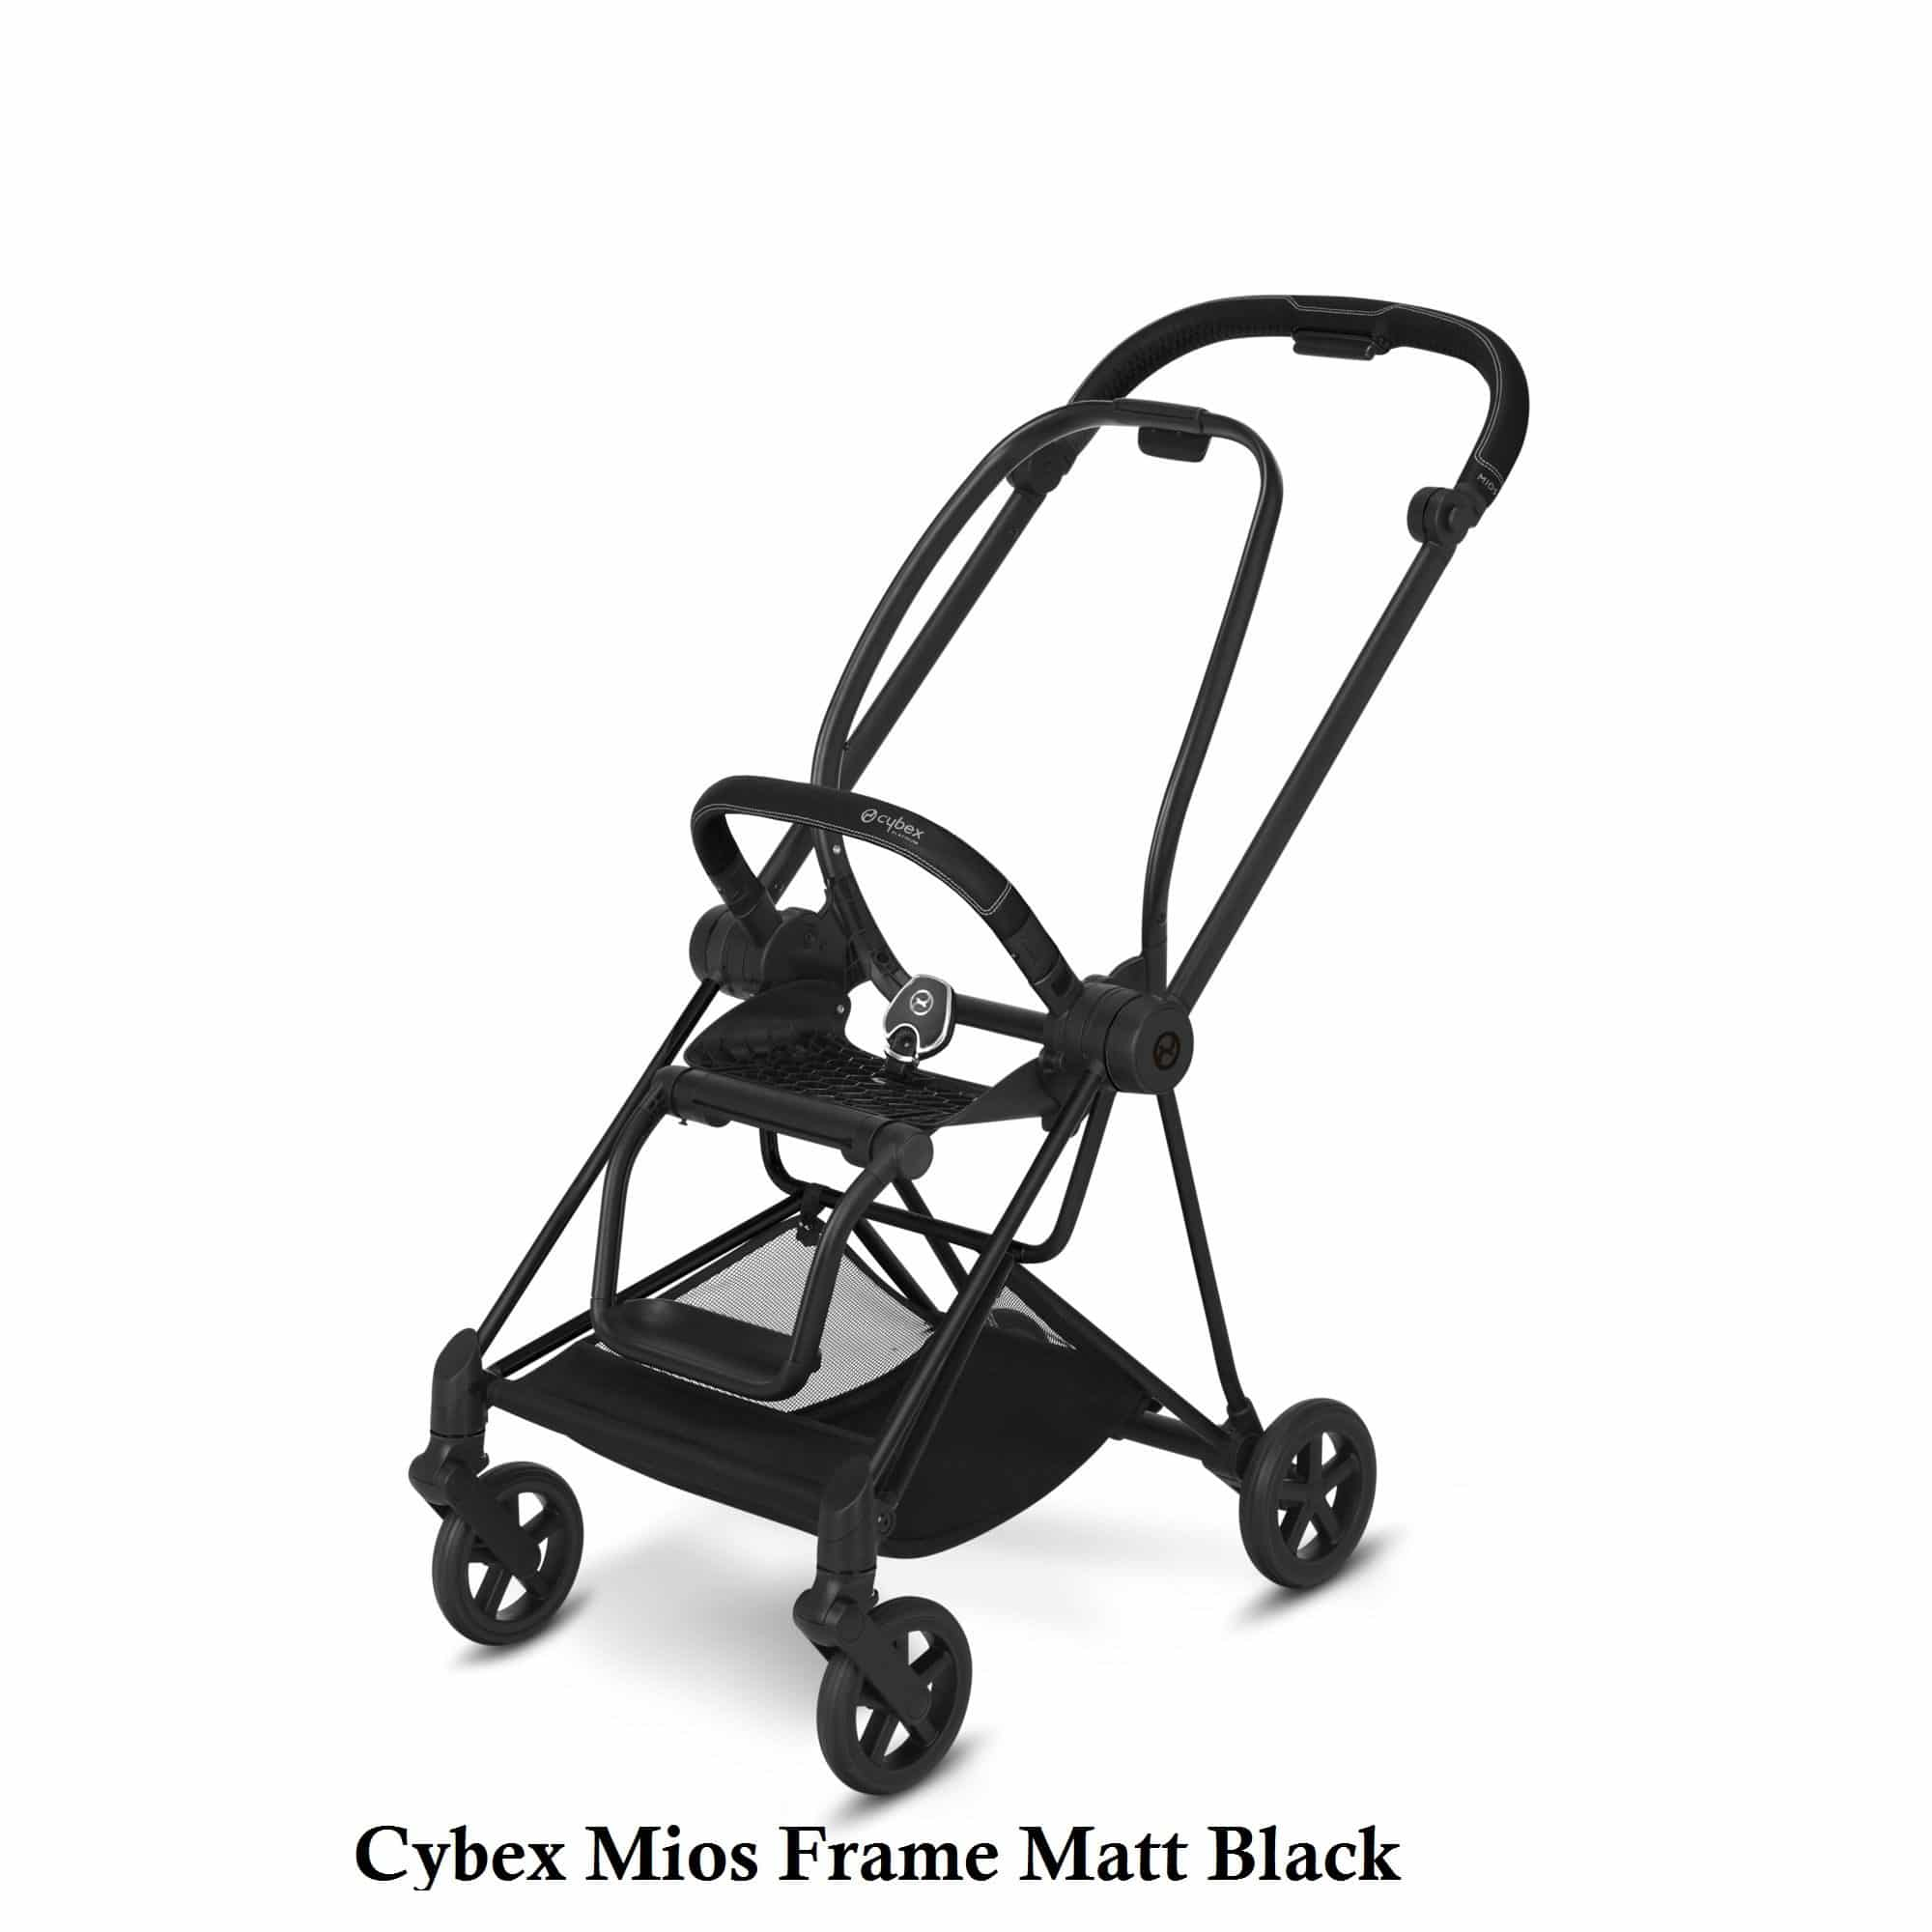 Cybex Mios Frame Matt Black